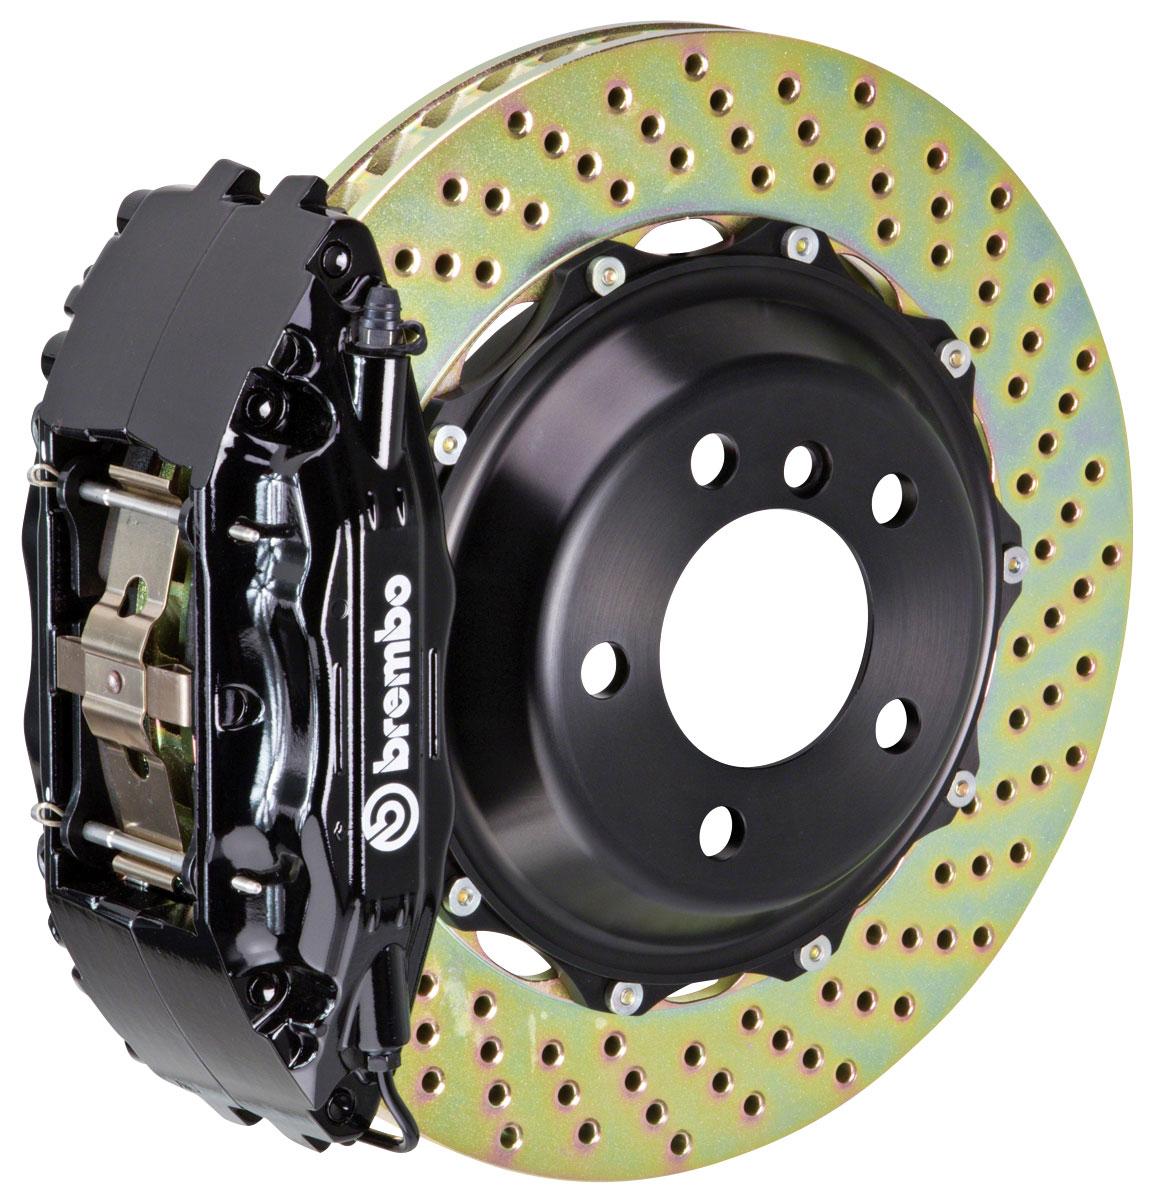 Brake Set, Brembo, 2002-06 Escalade/ESV/EXT, Rear, 2pc 355mm Rotors, 4P Calipers